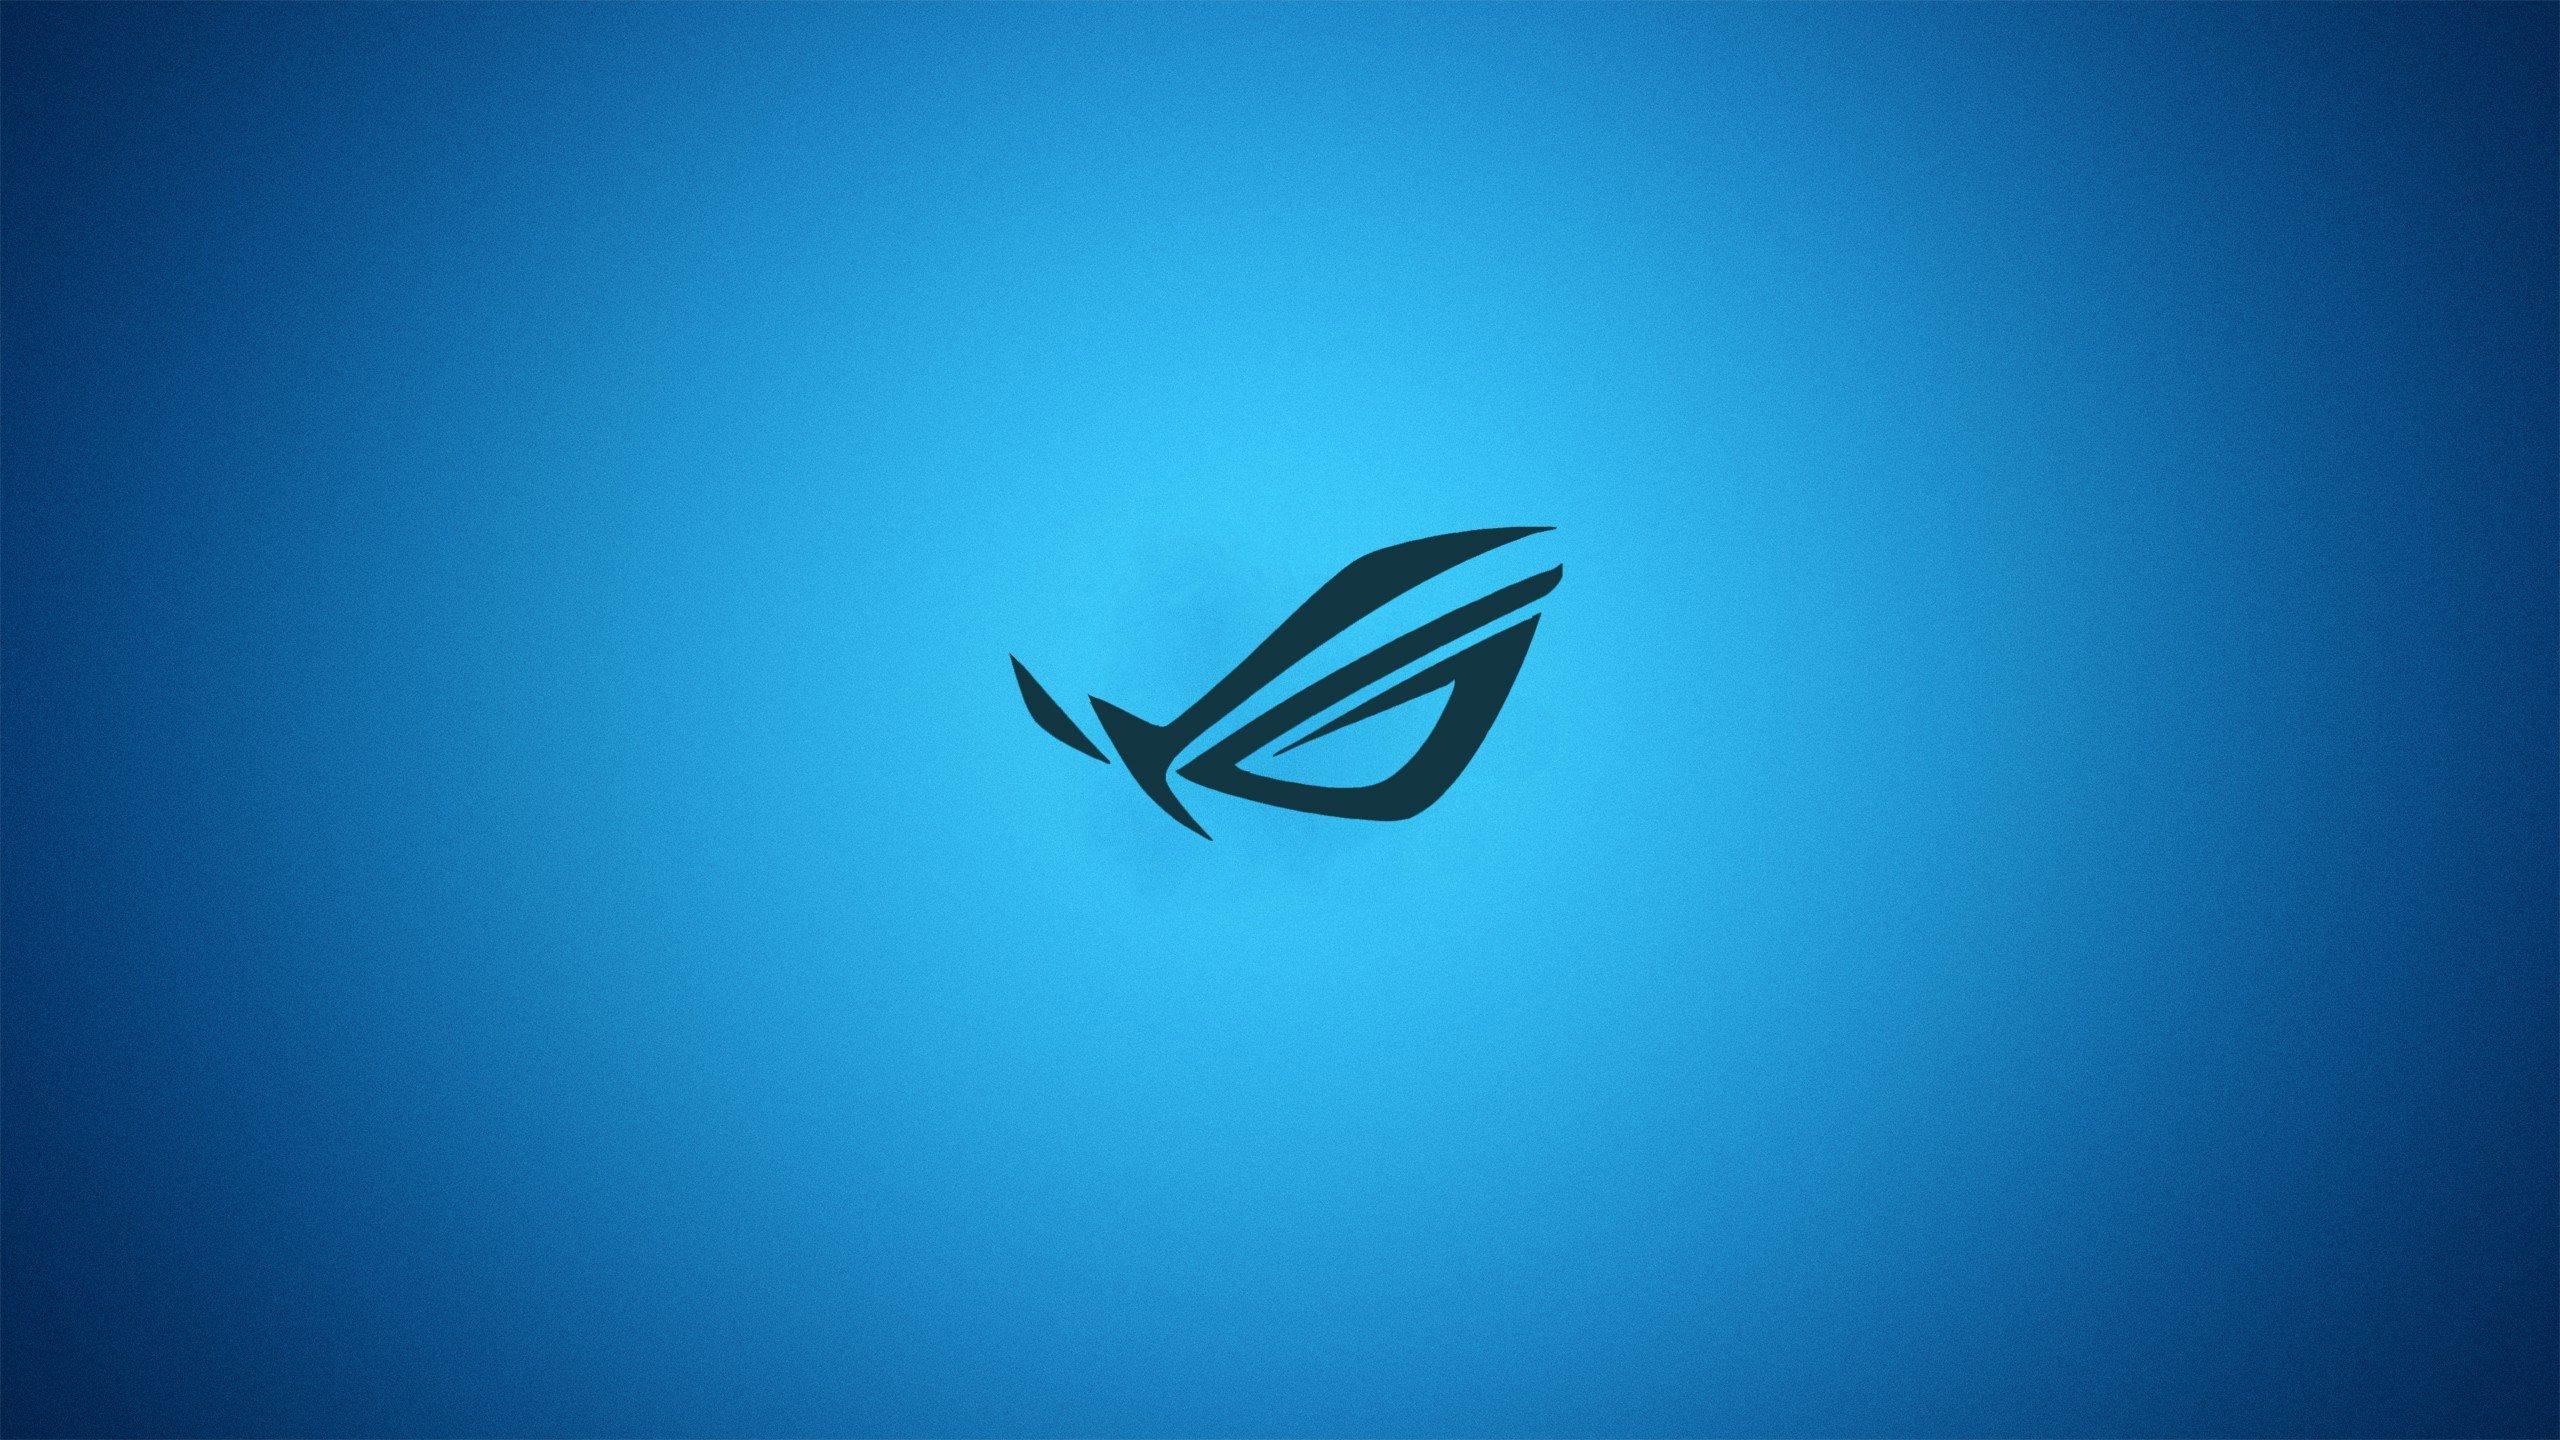 Asus Blue Wallpaper: Blue Gaming Wallpaper